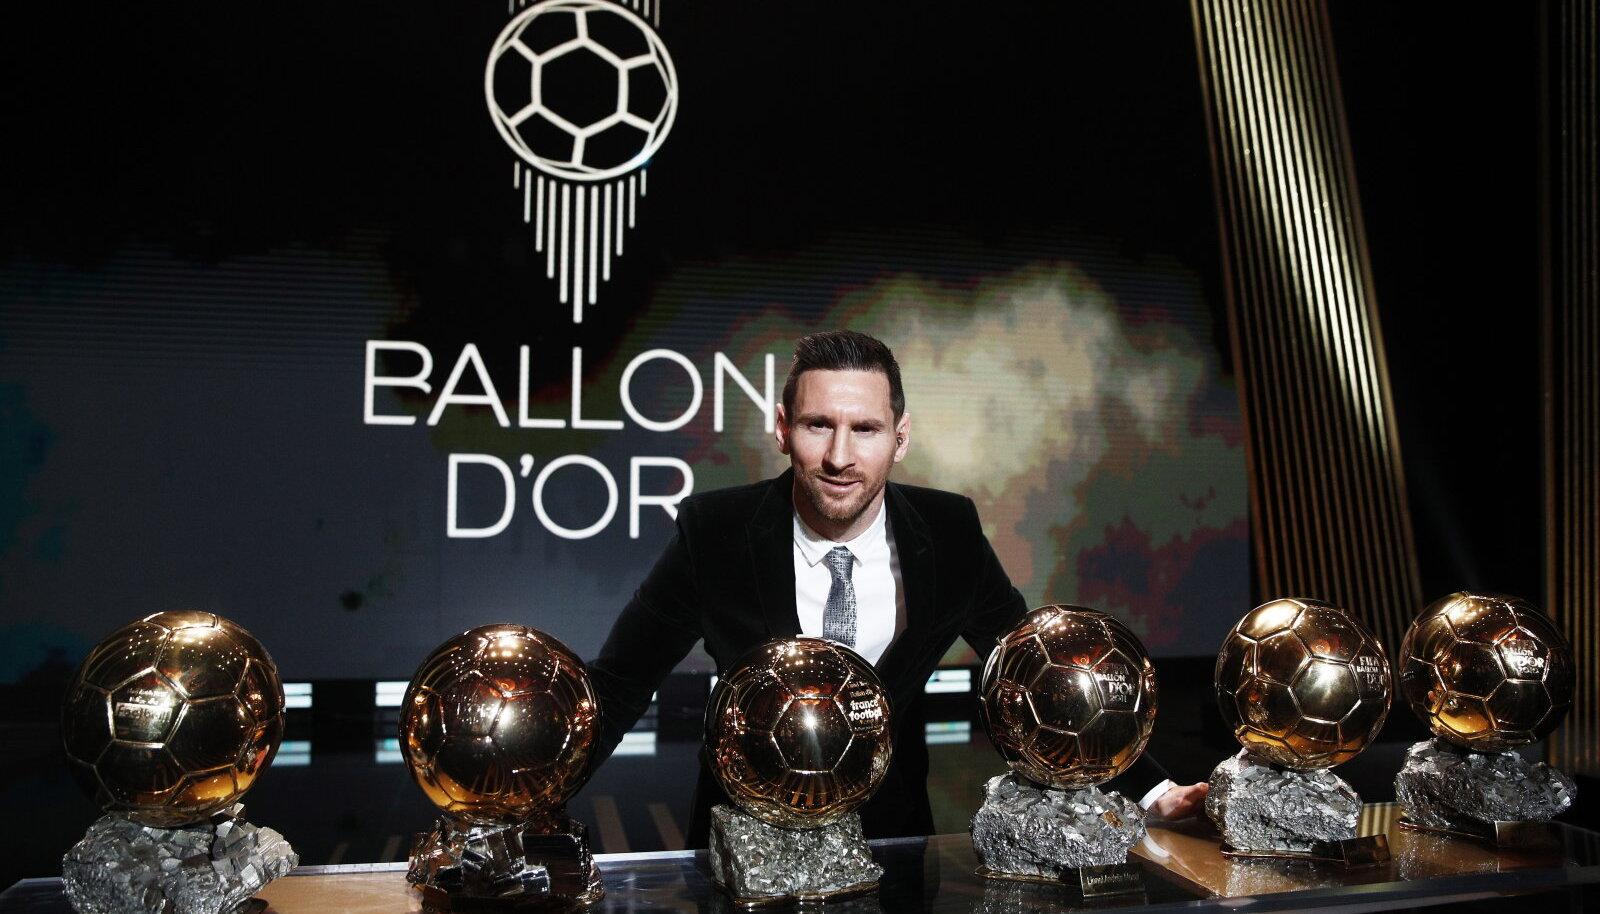 Lionel Messi ja tema kuus Ballon d'Or'i.